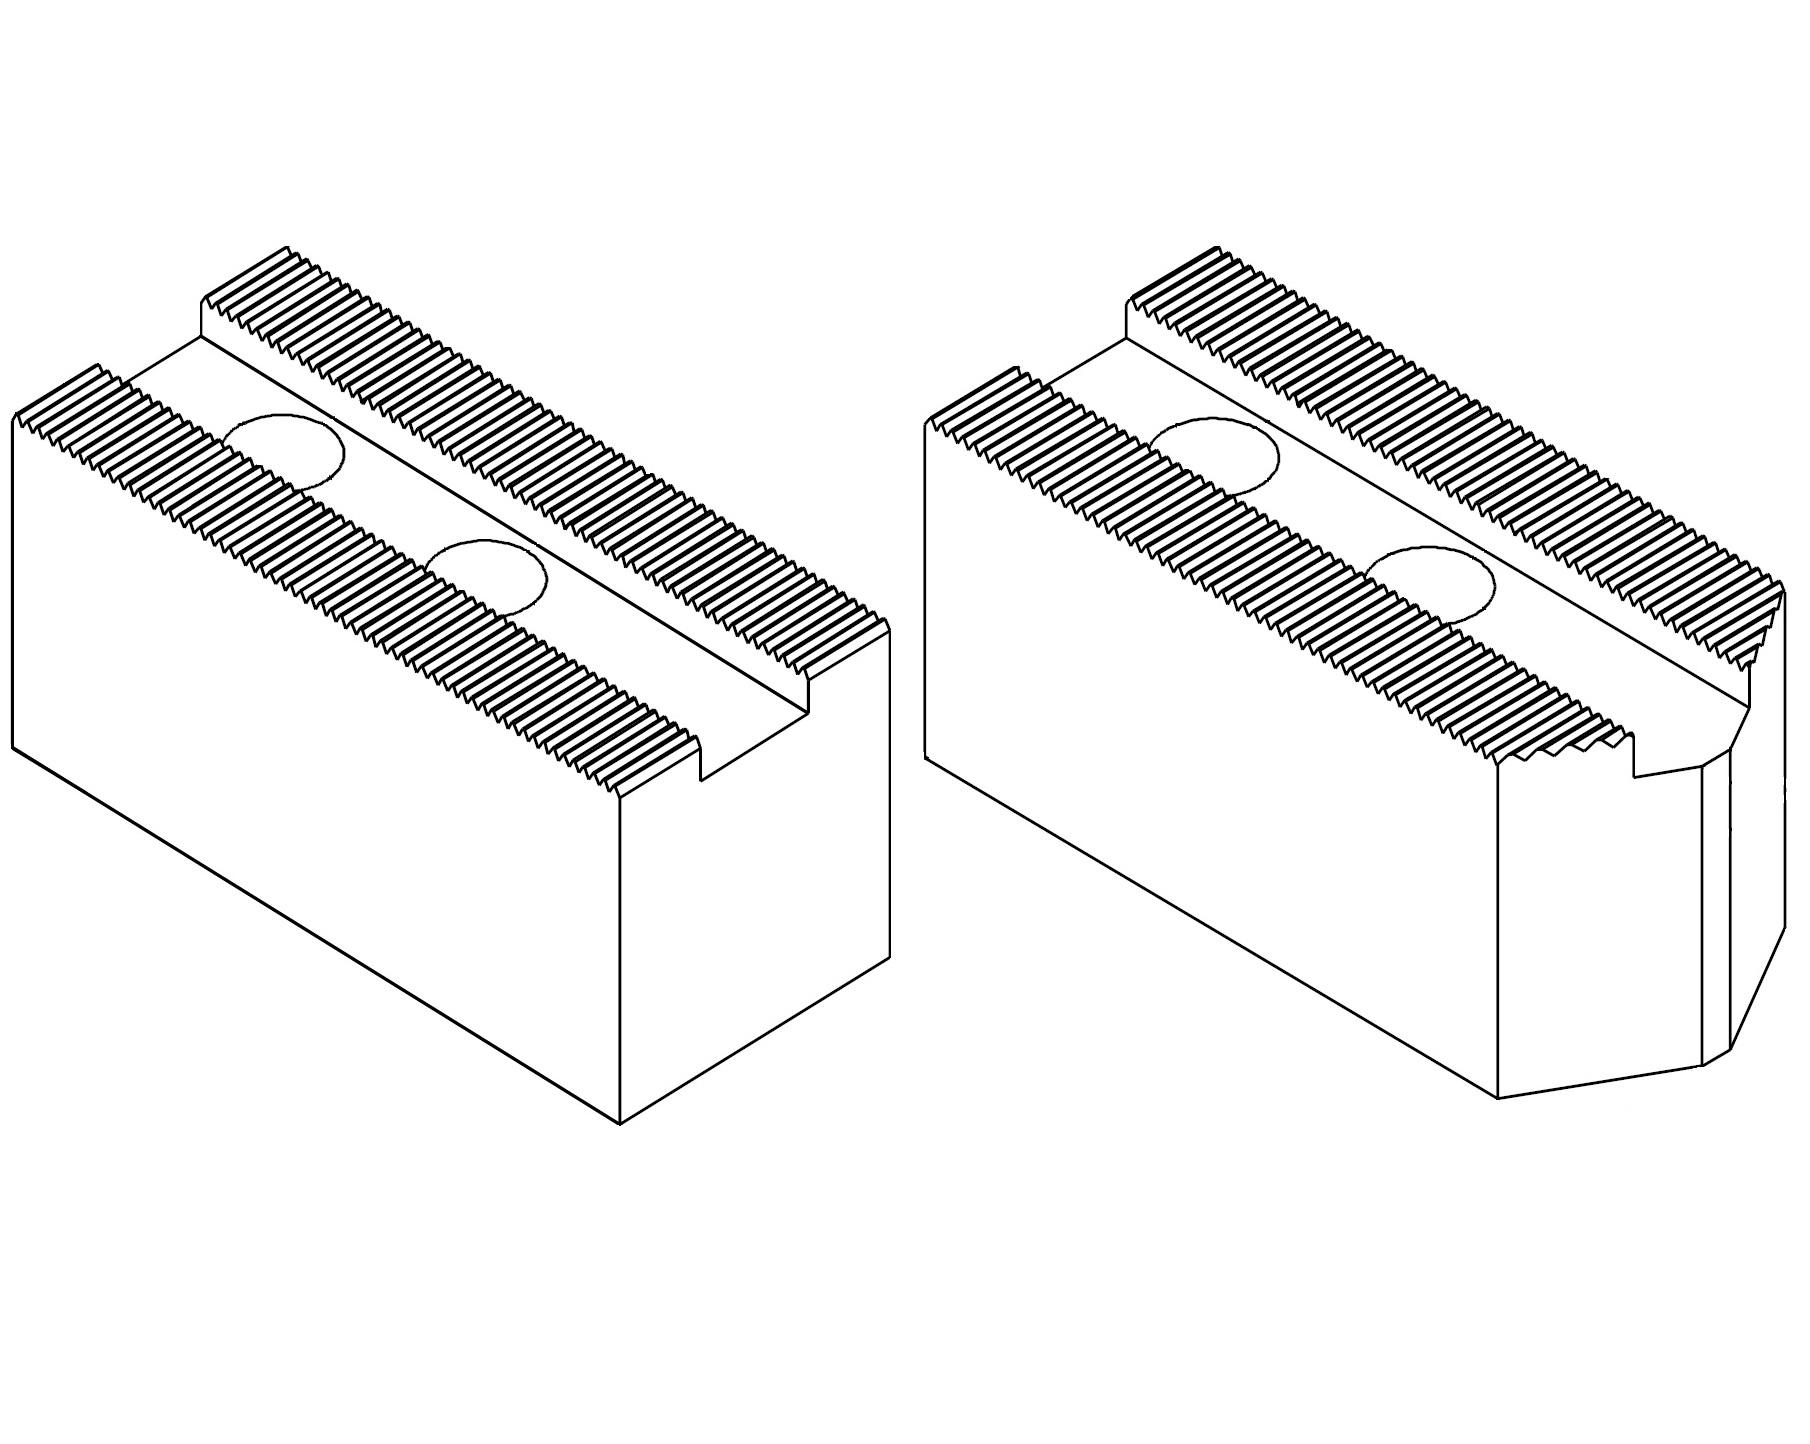 "Čelisti měkké 1/16""x90°, šířka drážky - 11 (sklíčidla pr. 125 - 130 mm)"